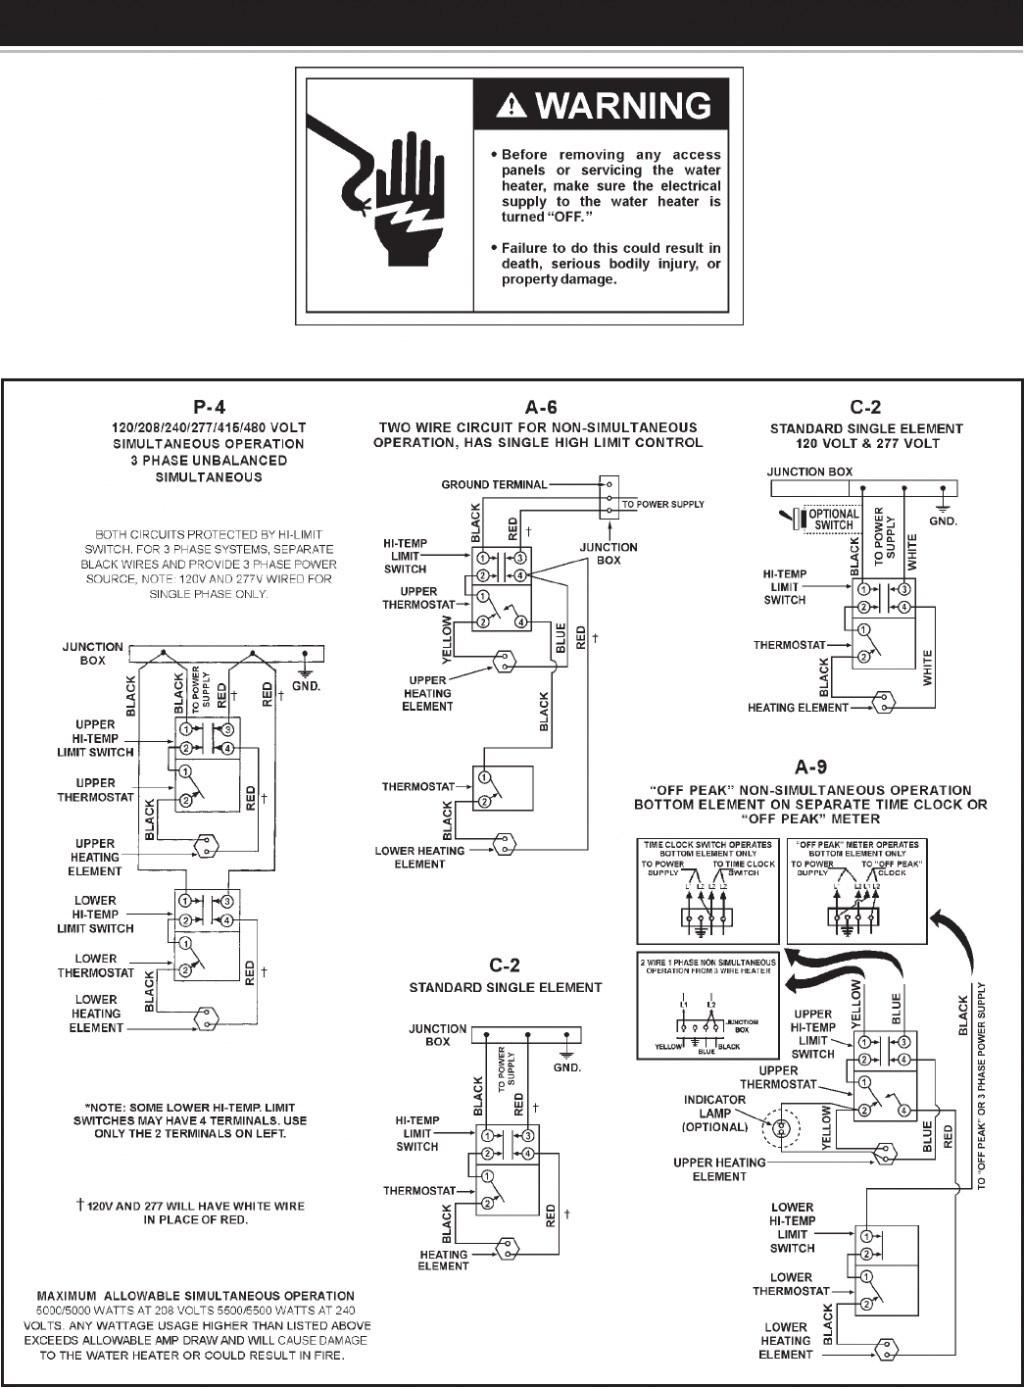 marathon boat lift motor wiring diagram outdoor faucet repair ao smith free